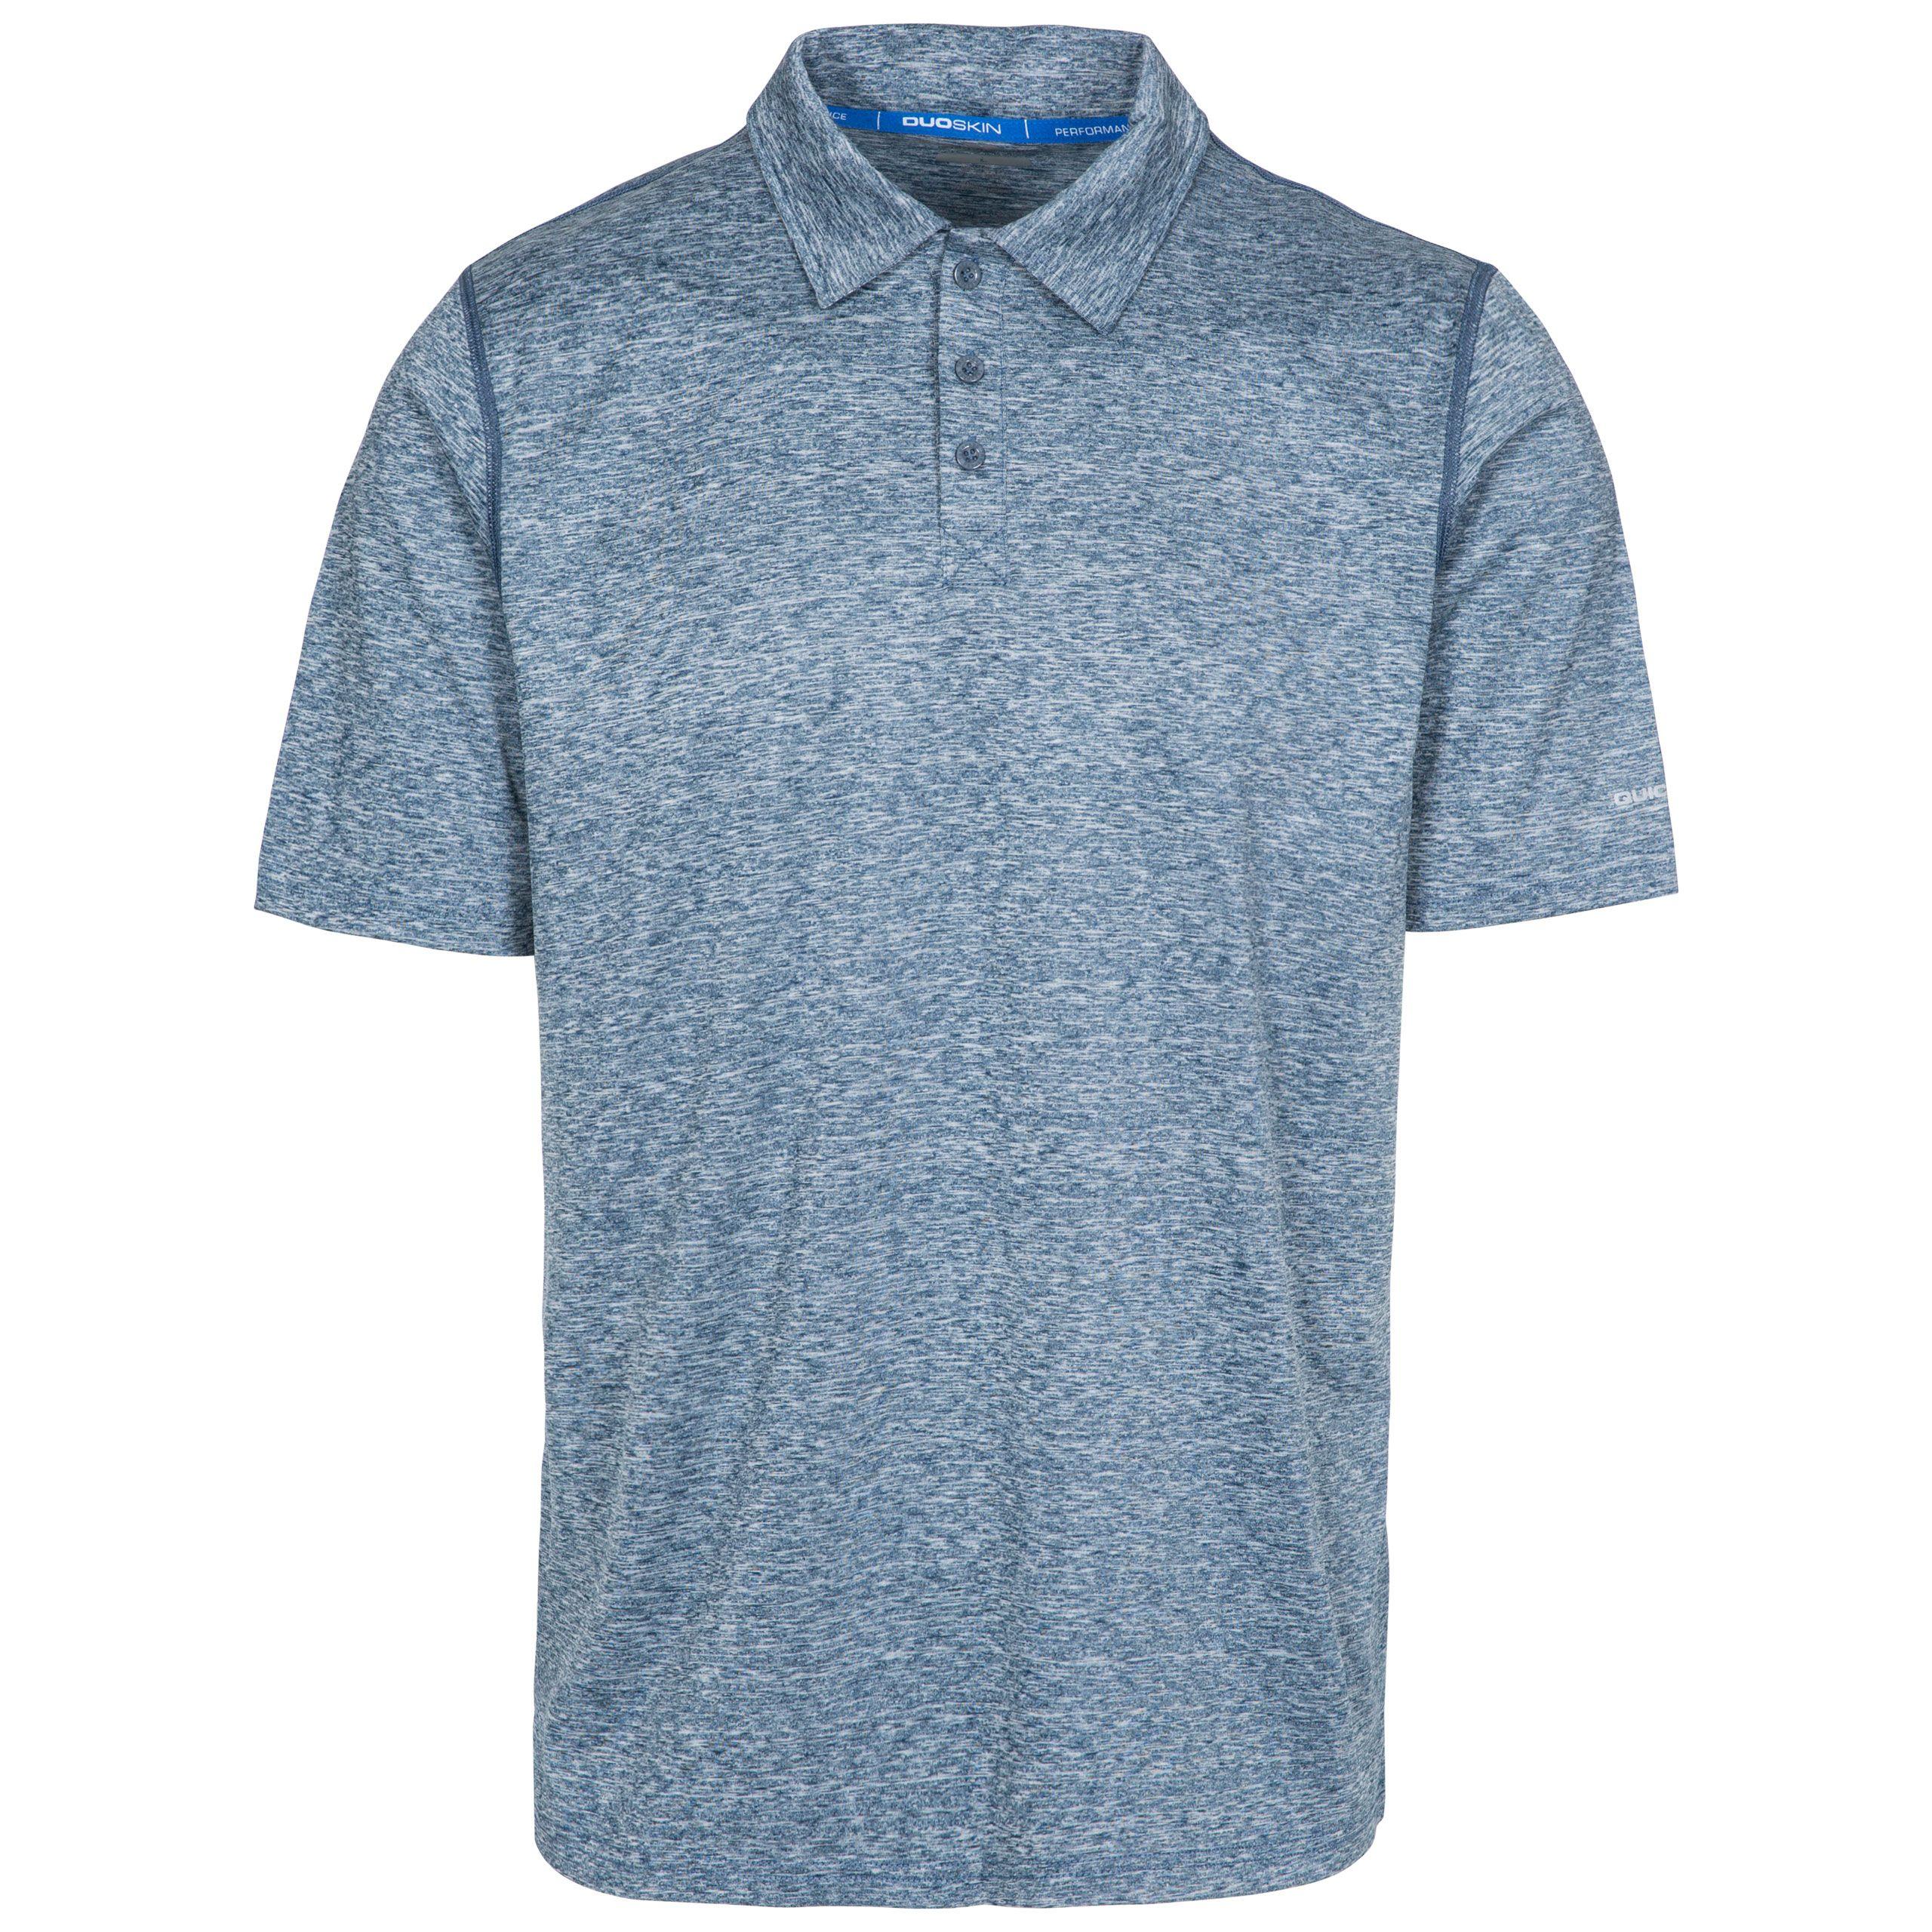 Shougle Mens Checked Cotton Shirt